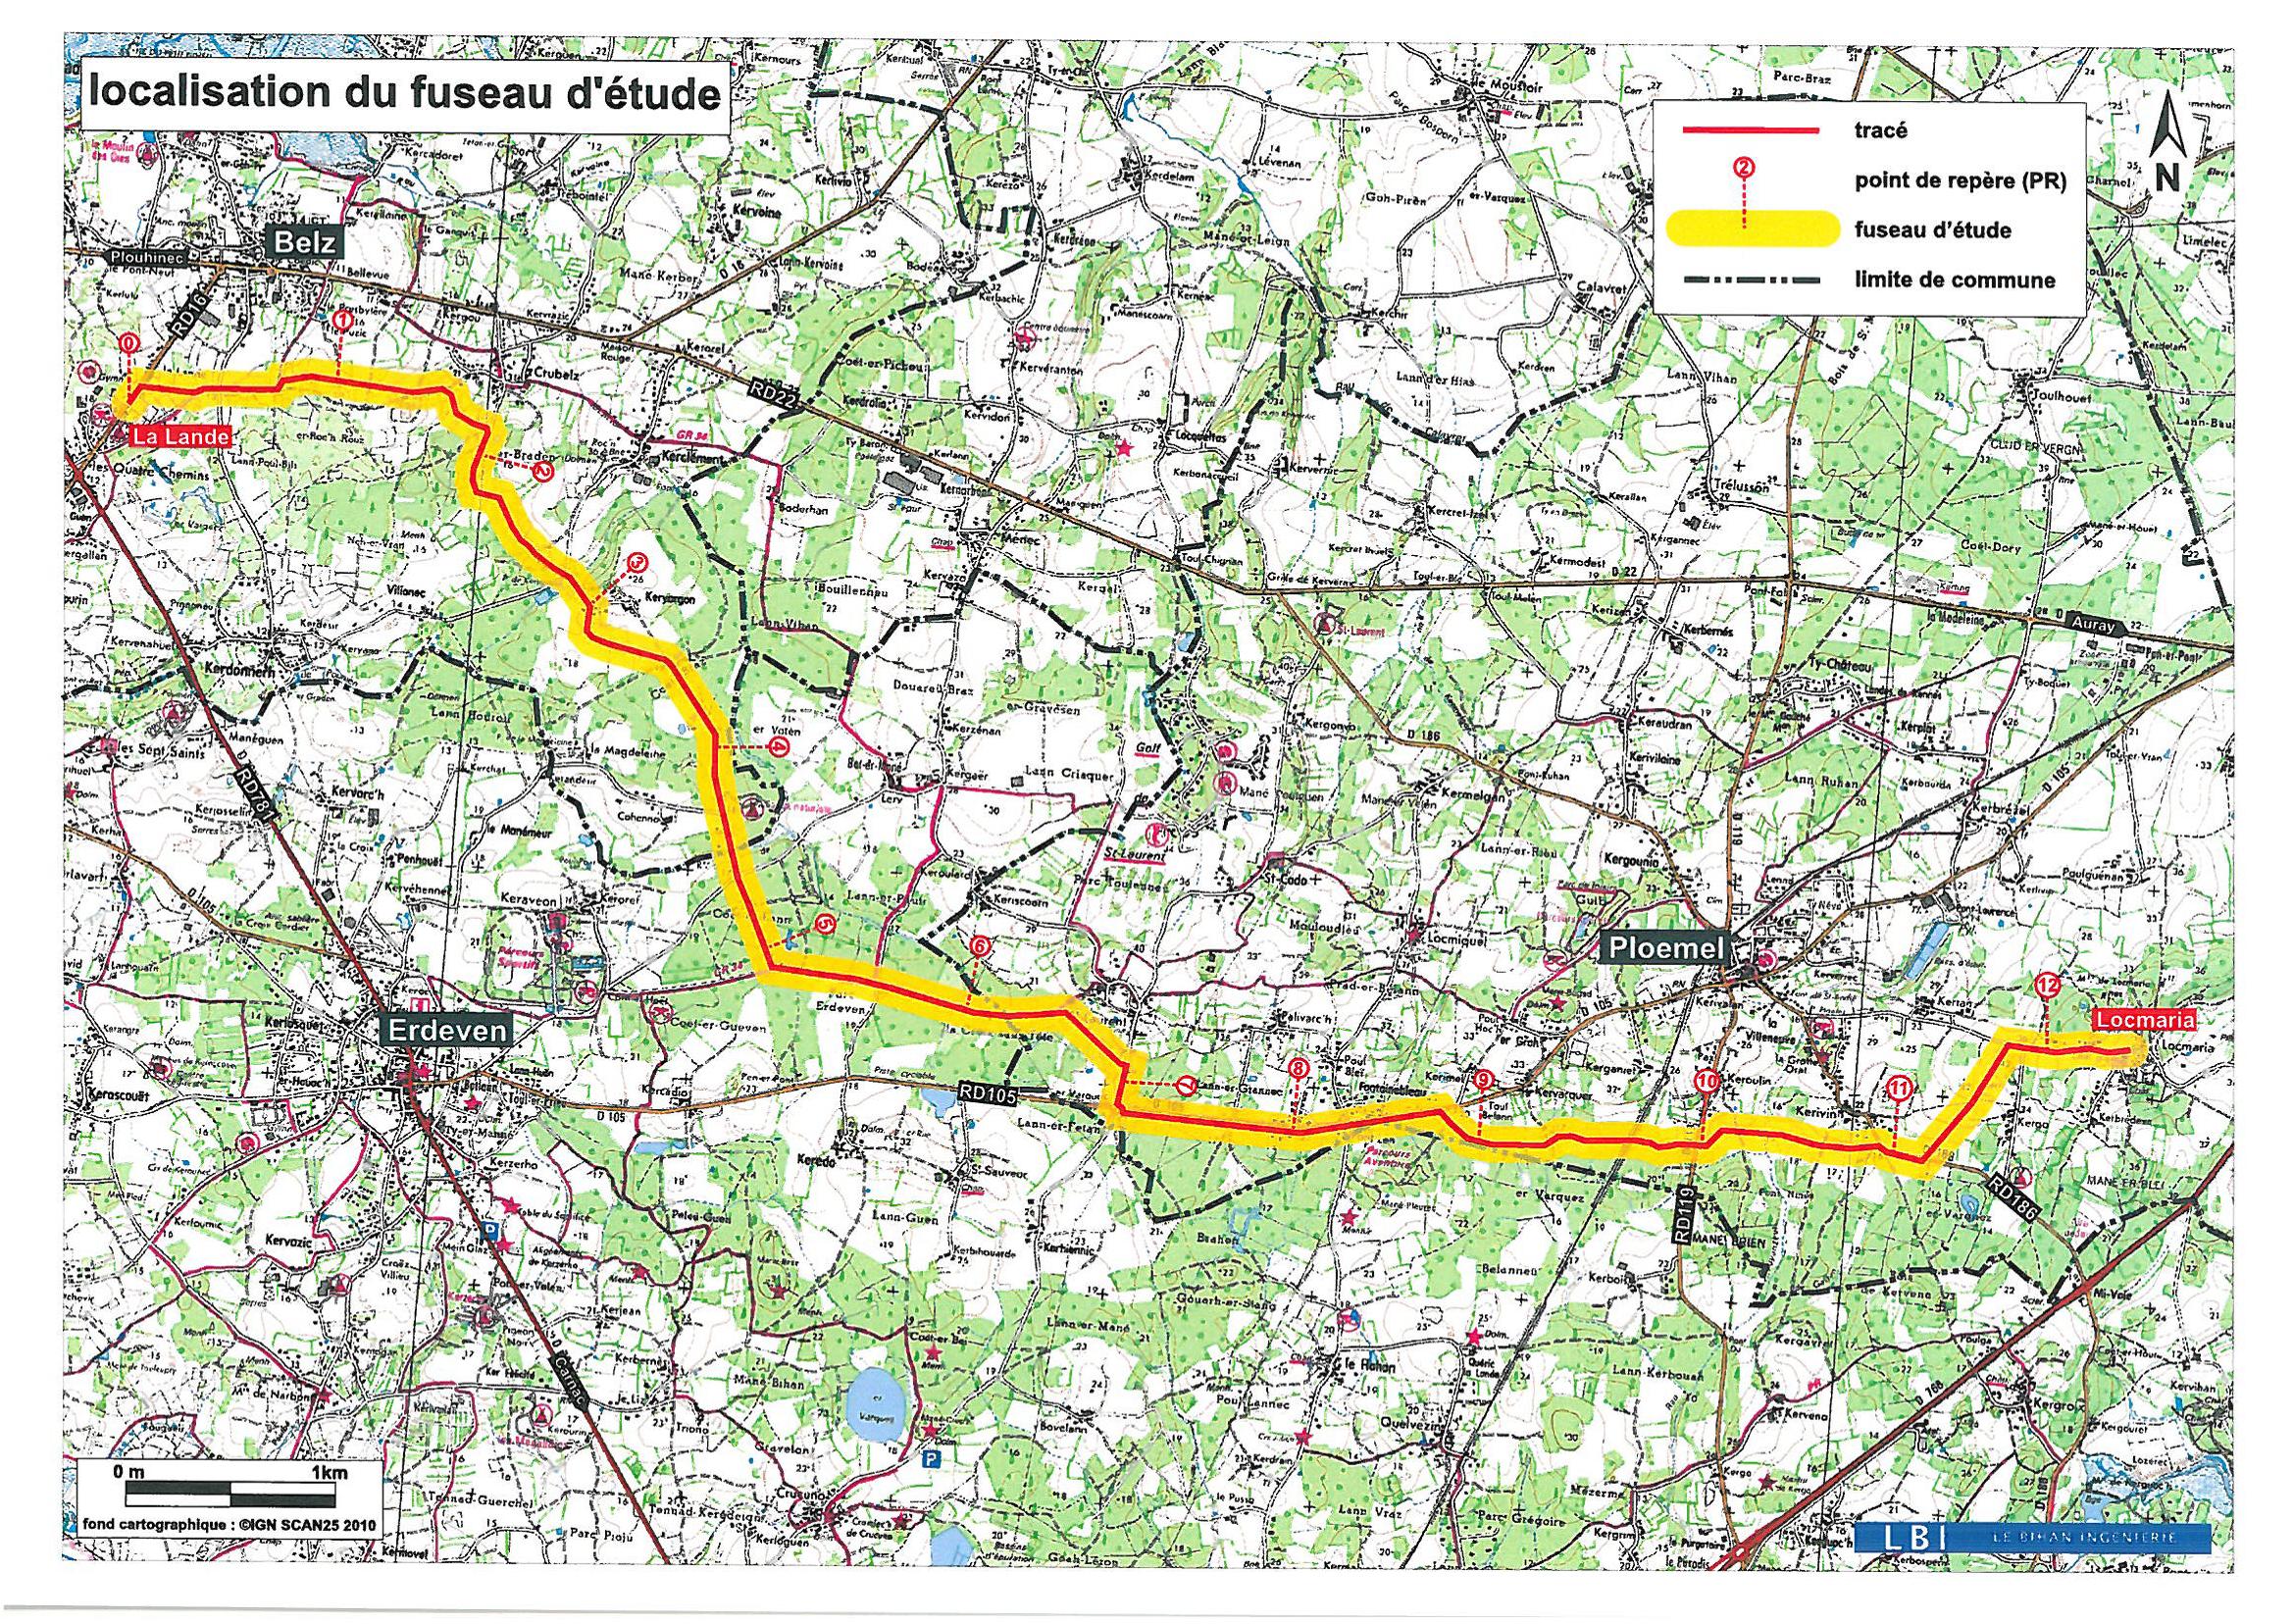 feeder Belz-Ploemel - tracé